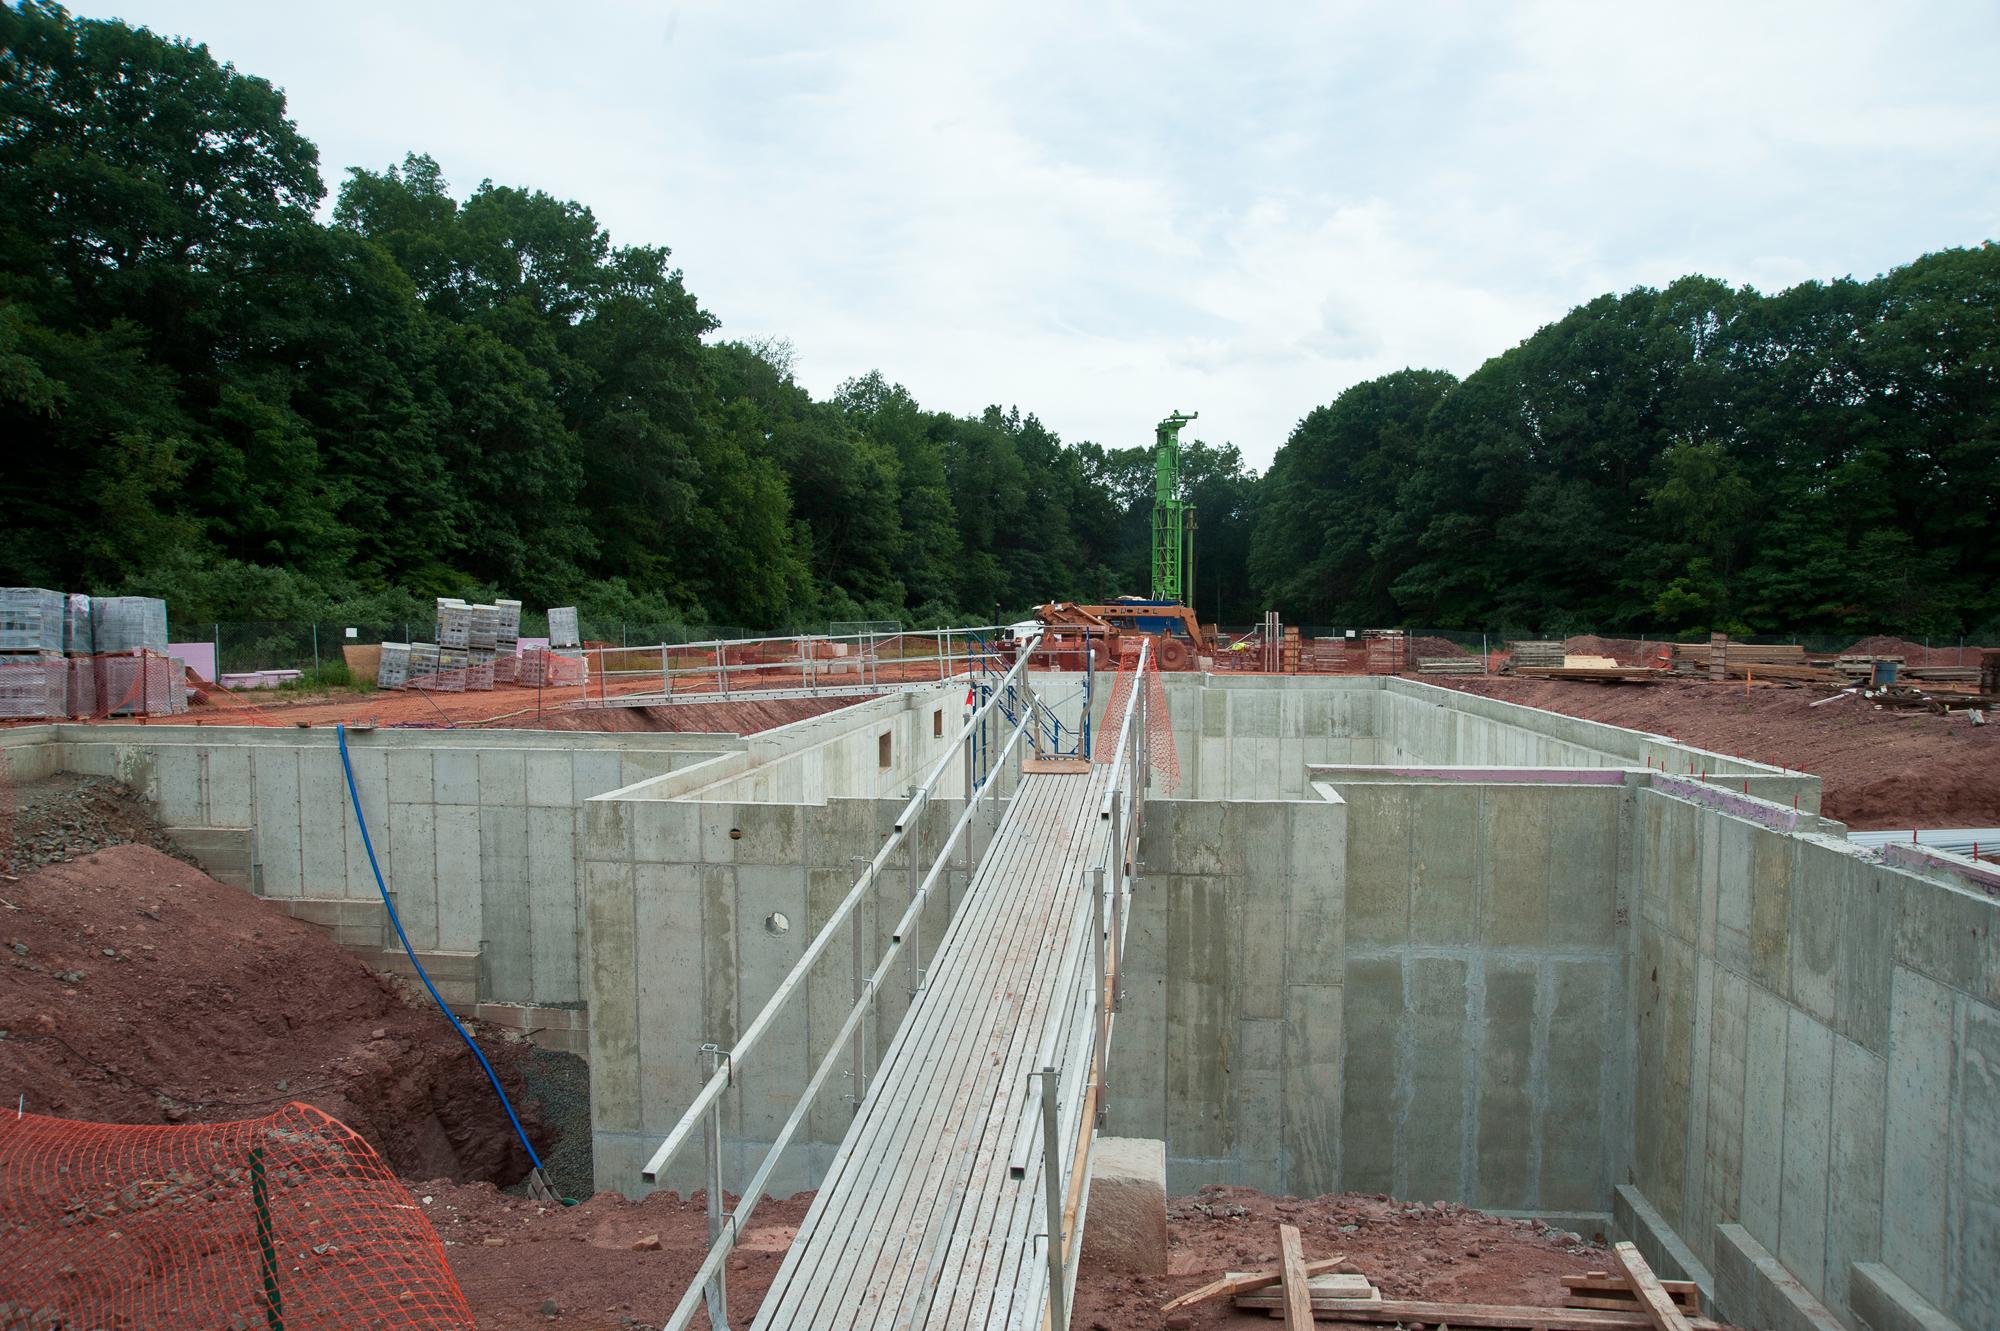 construction and progress photo by John giammatteo of Kohler Environmental Center